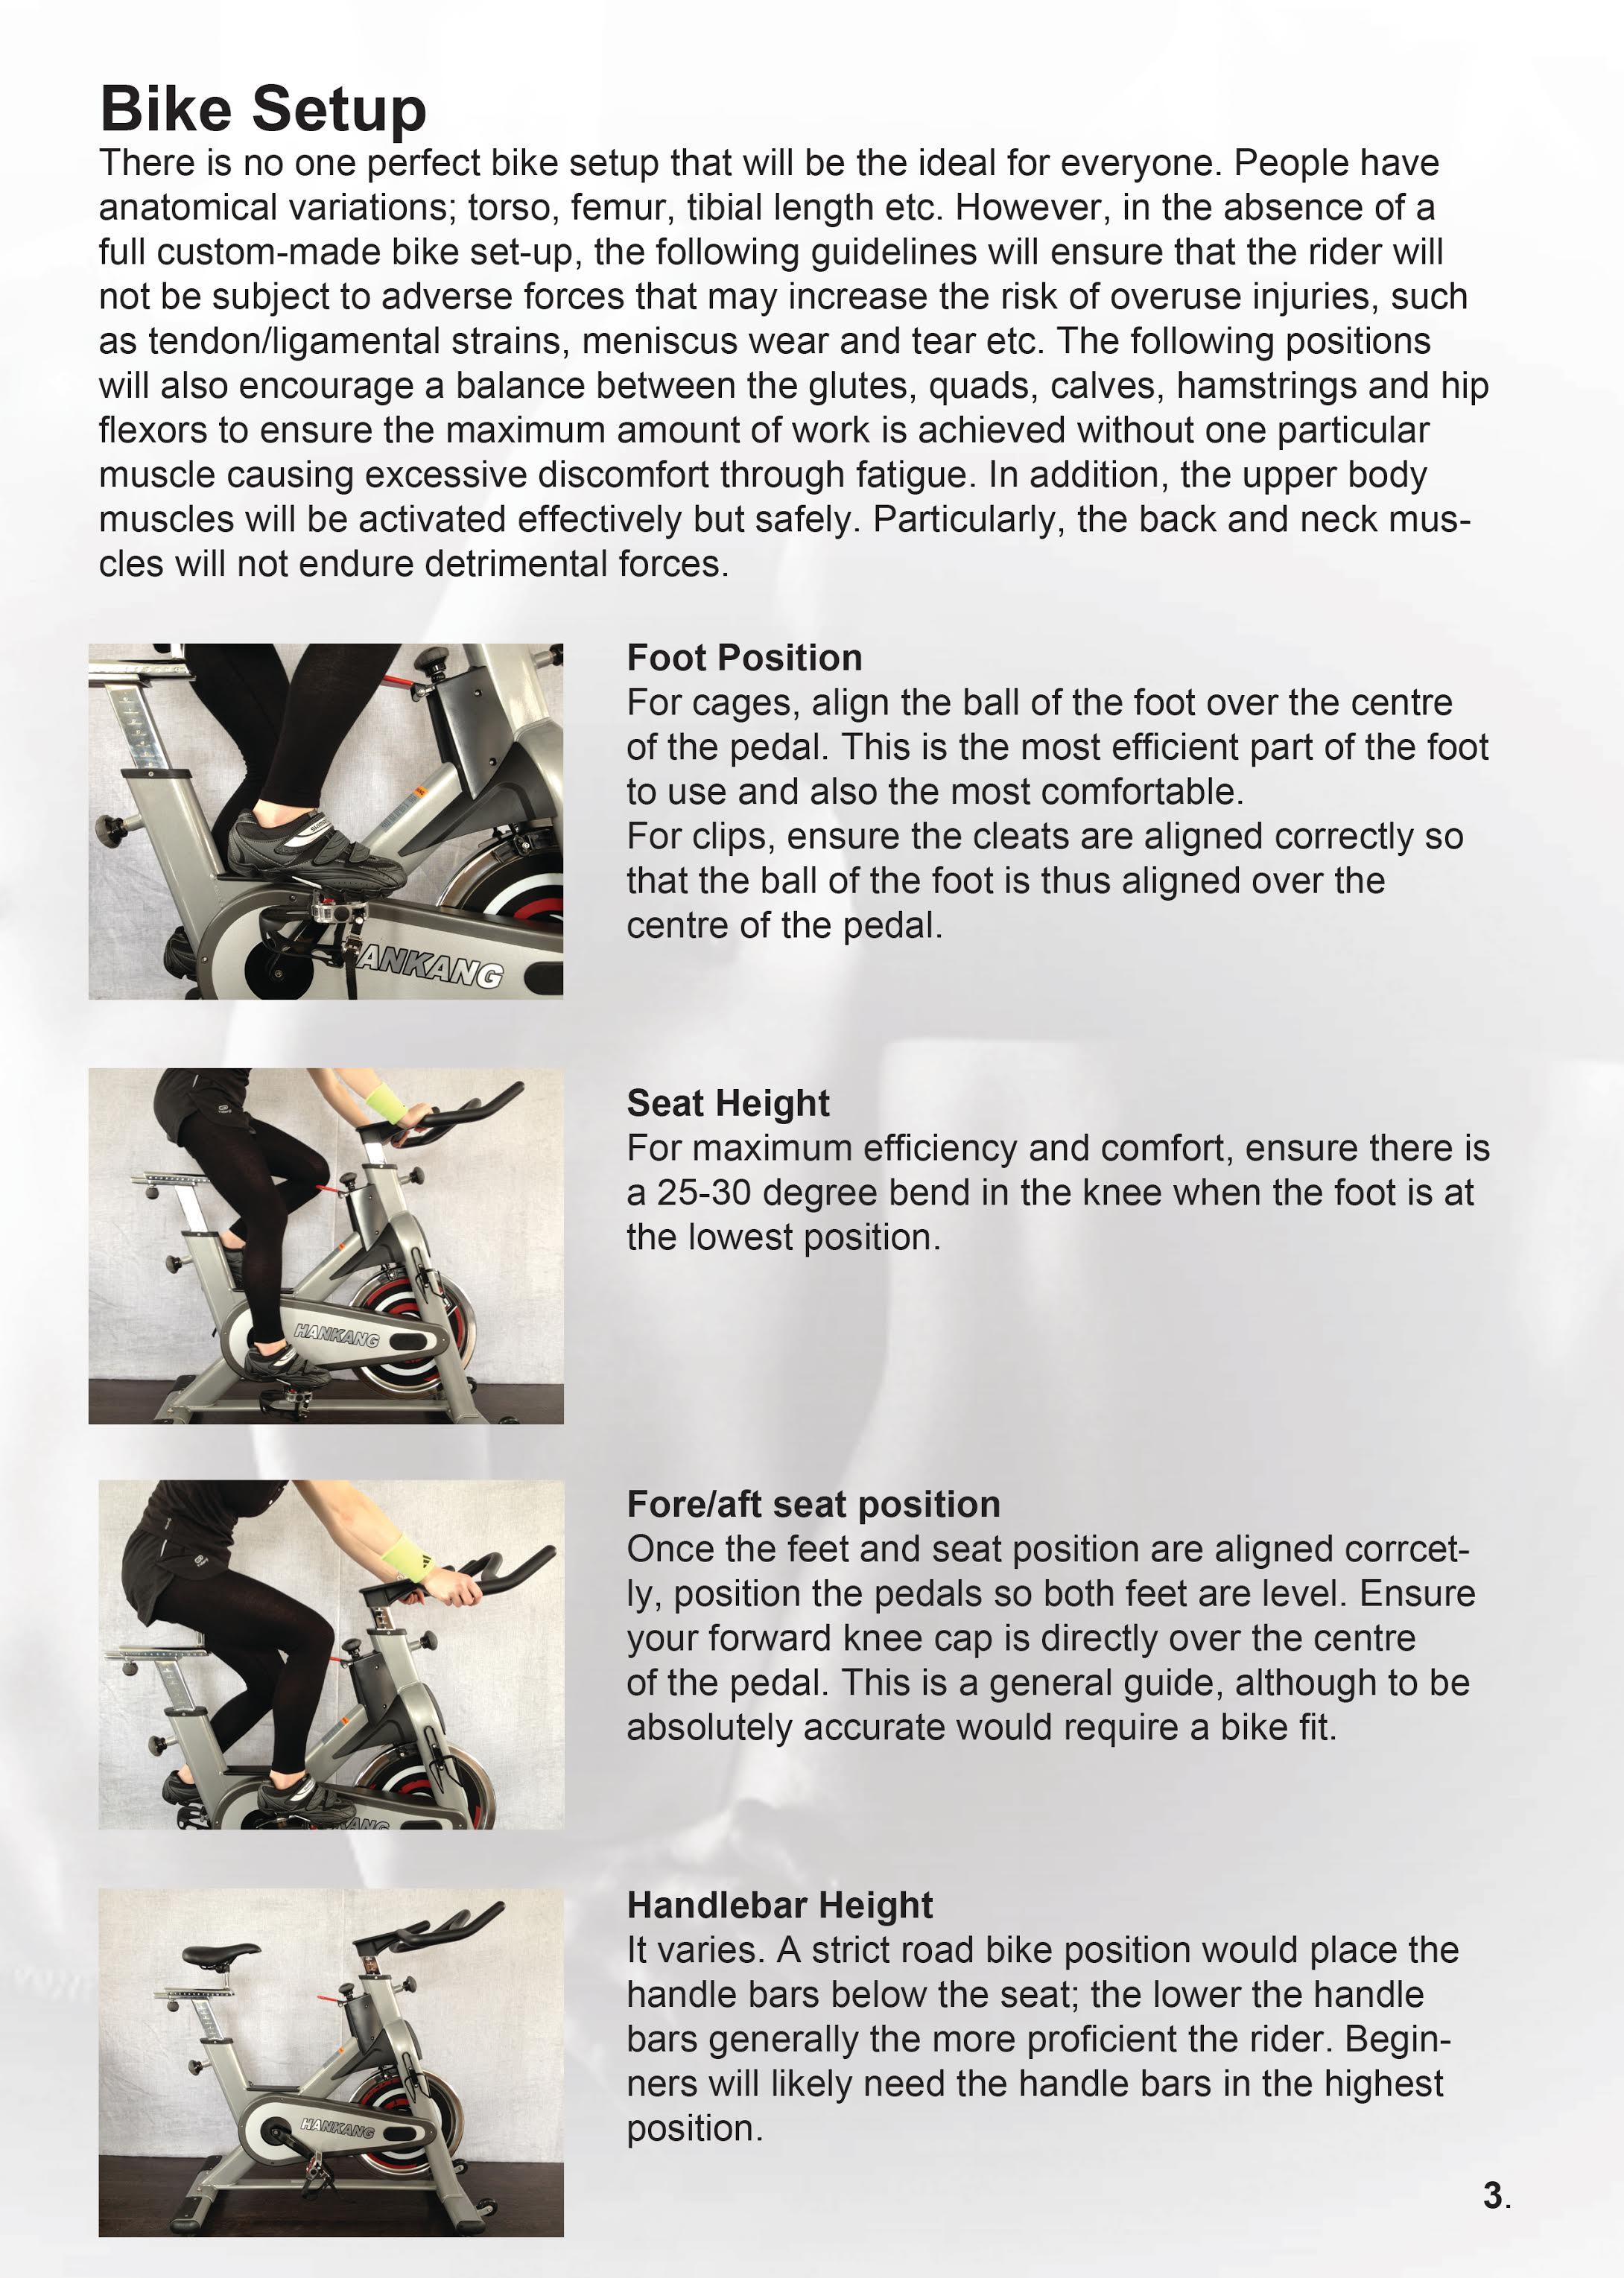 BPM_Bike_Lab_Bike_set_up_guide